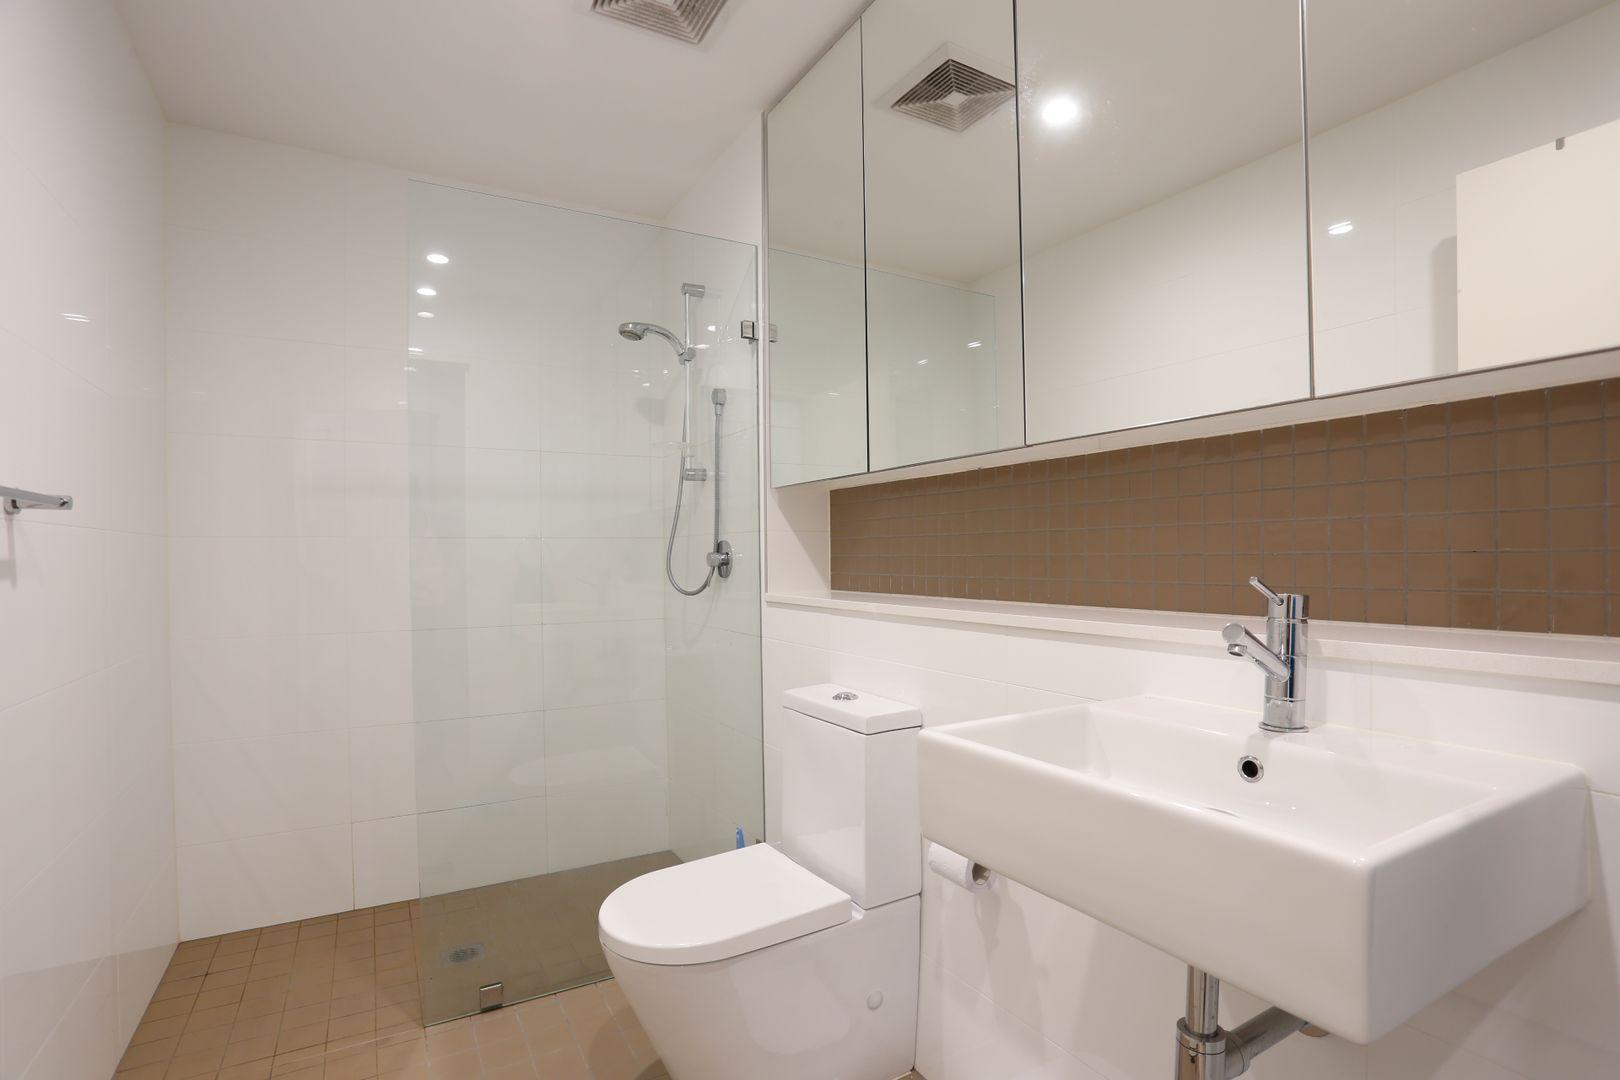 307C/359 Illawarra Road, Marrickville NSW 2204, Image 1